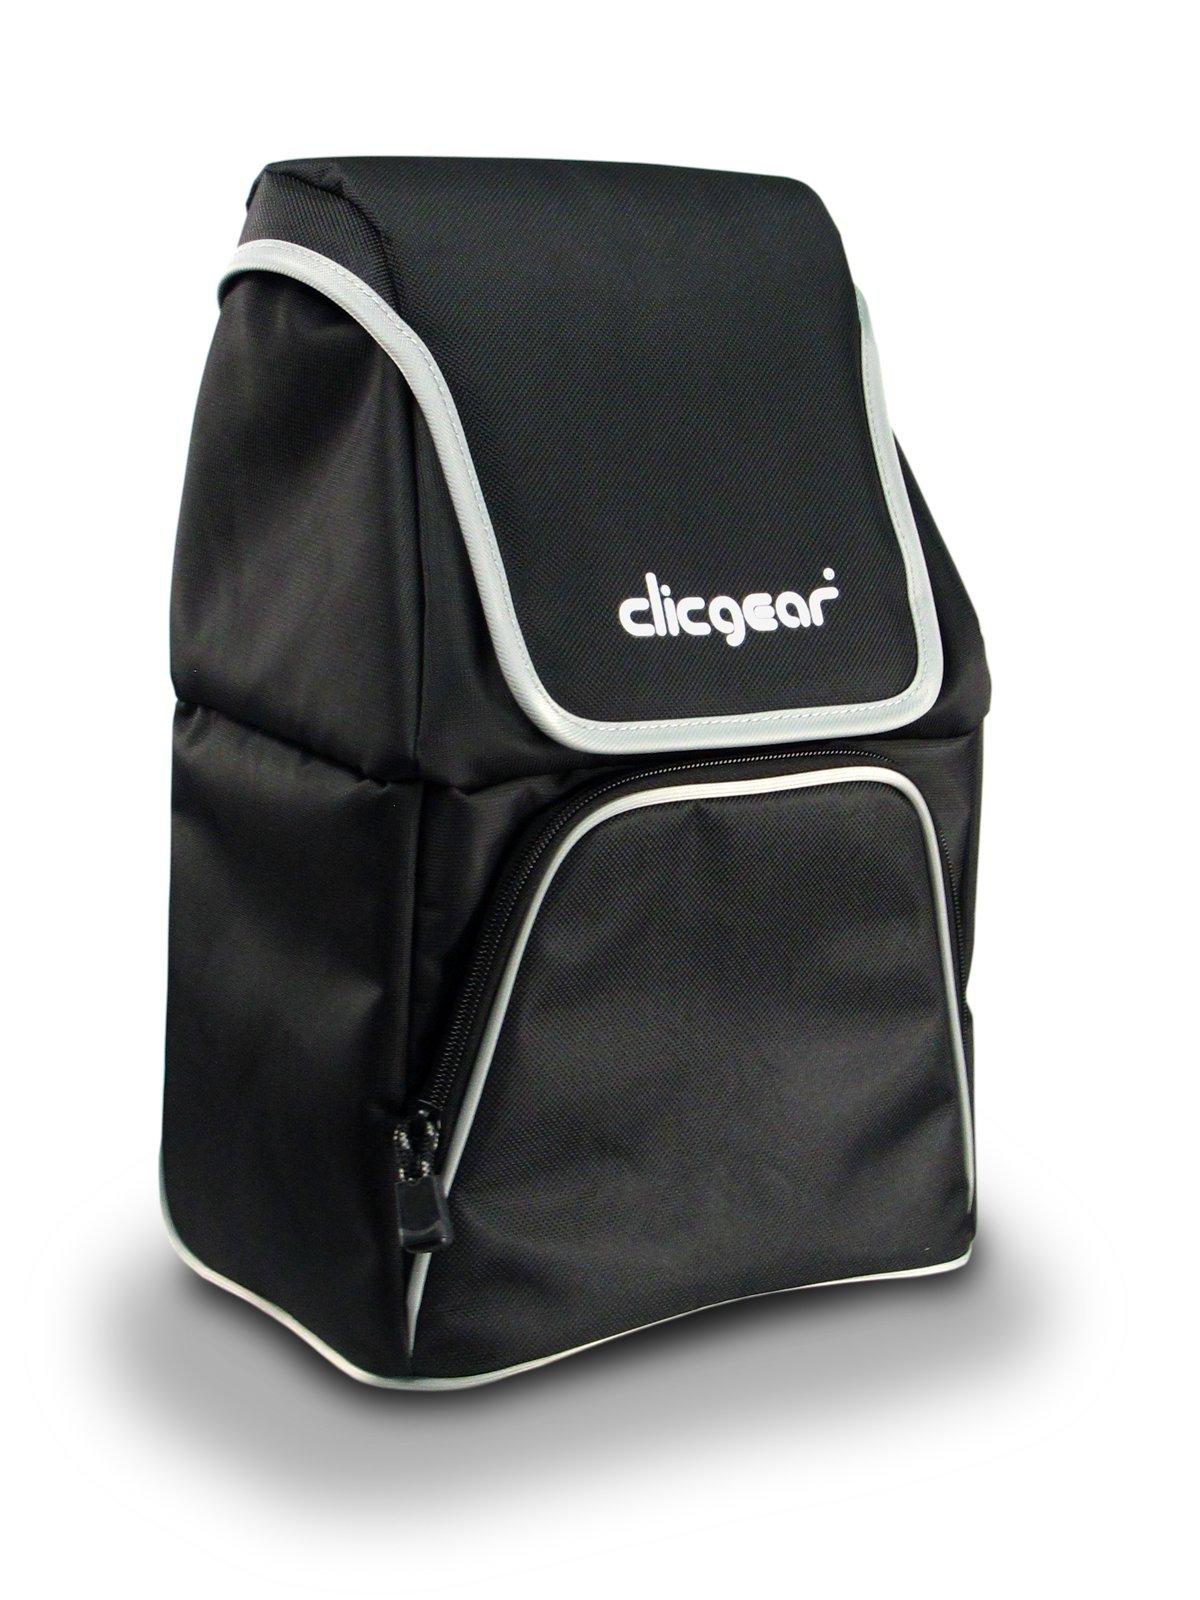 Clicgear Push Cart Insulated Cooler Bag